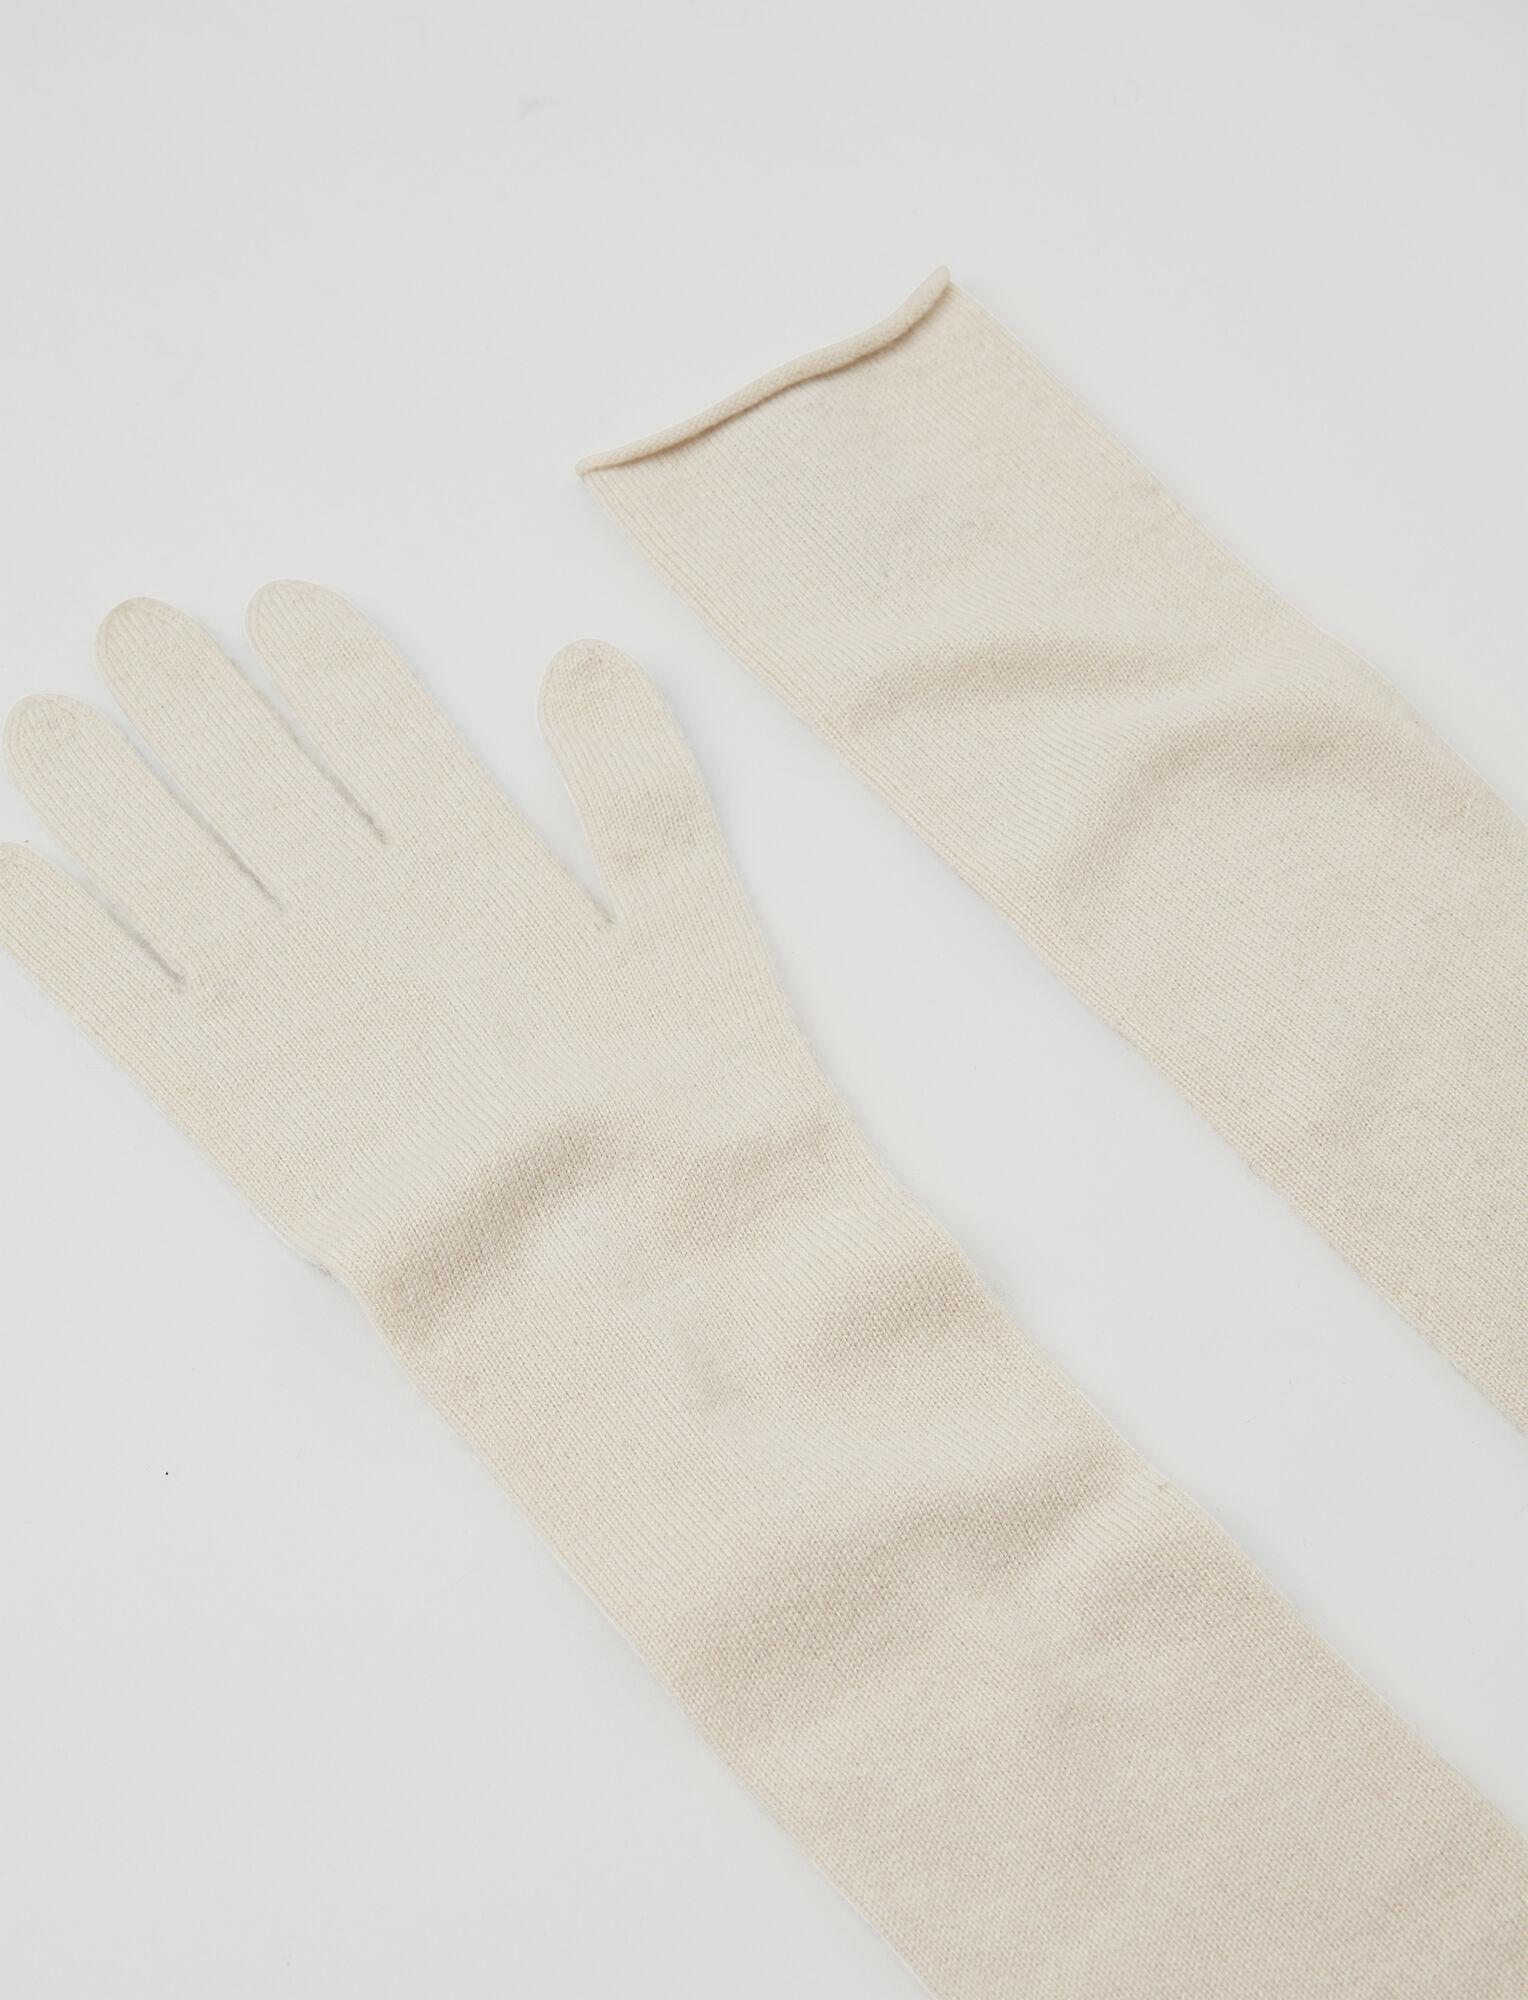 Joseph, Mongolian Cashmere Gloves, in ECRU